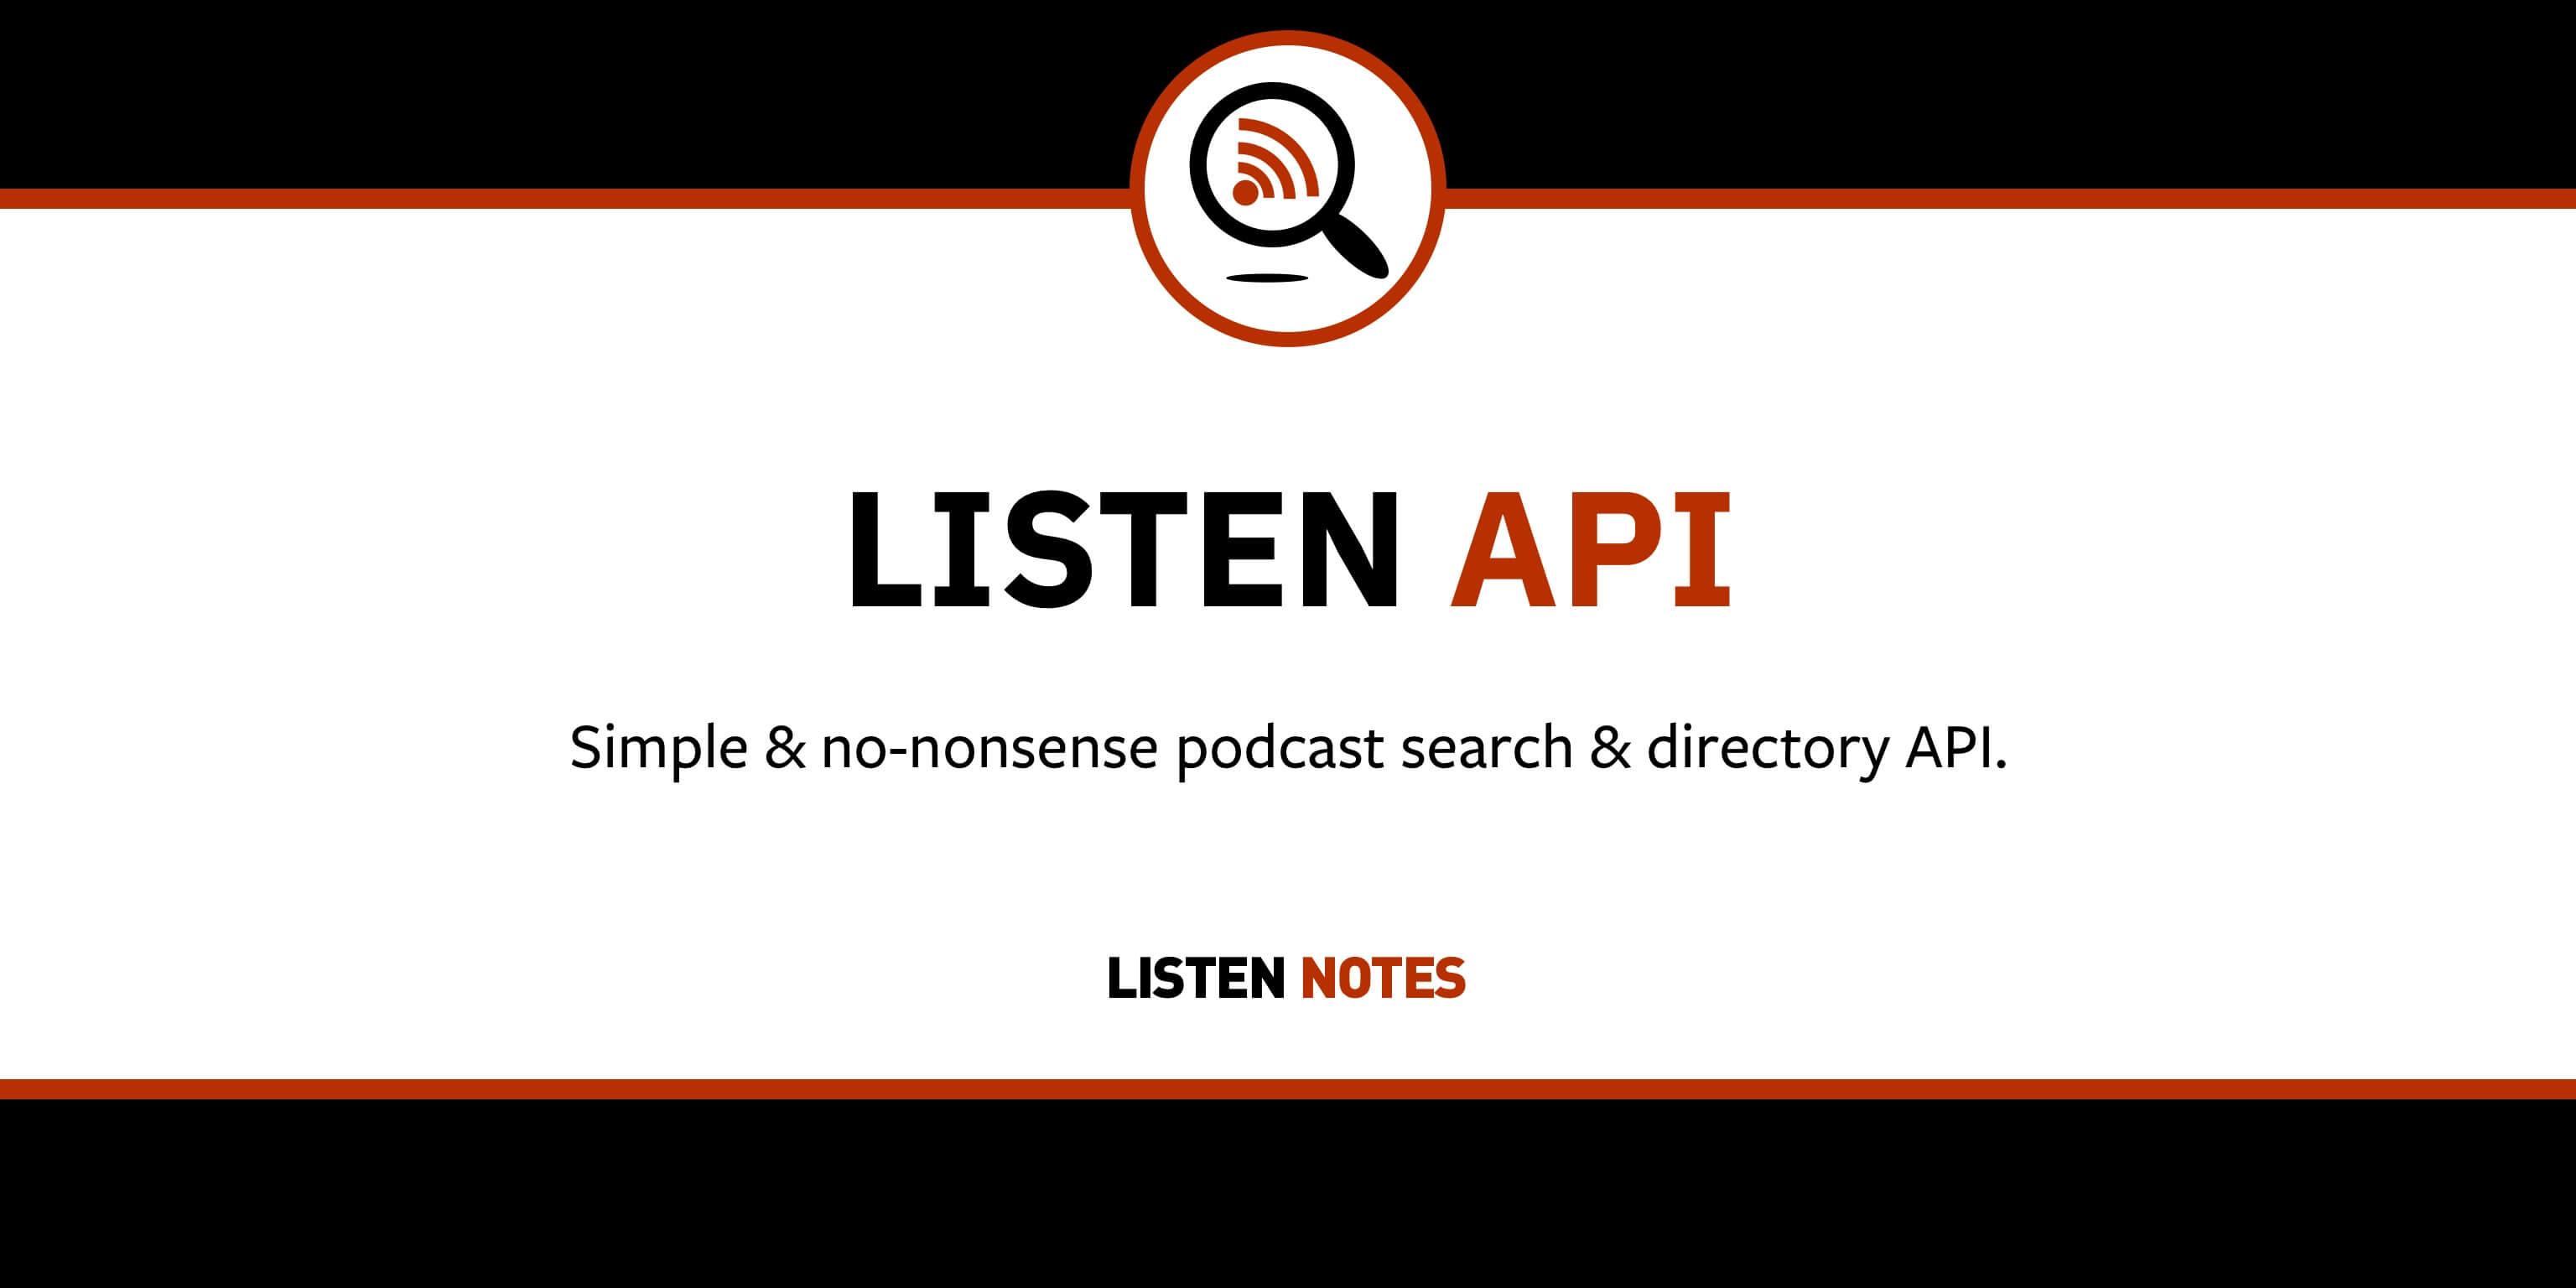 Listen API: Podcast Search & Directory API